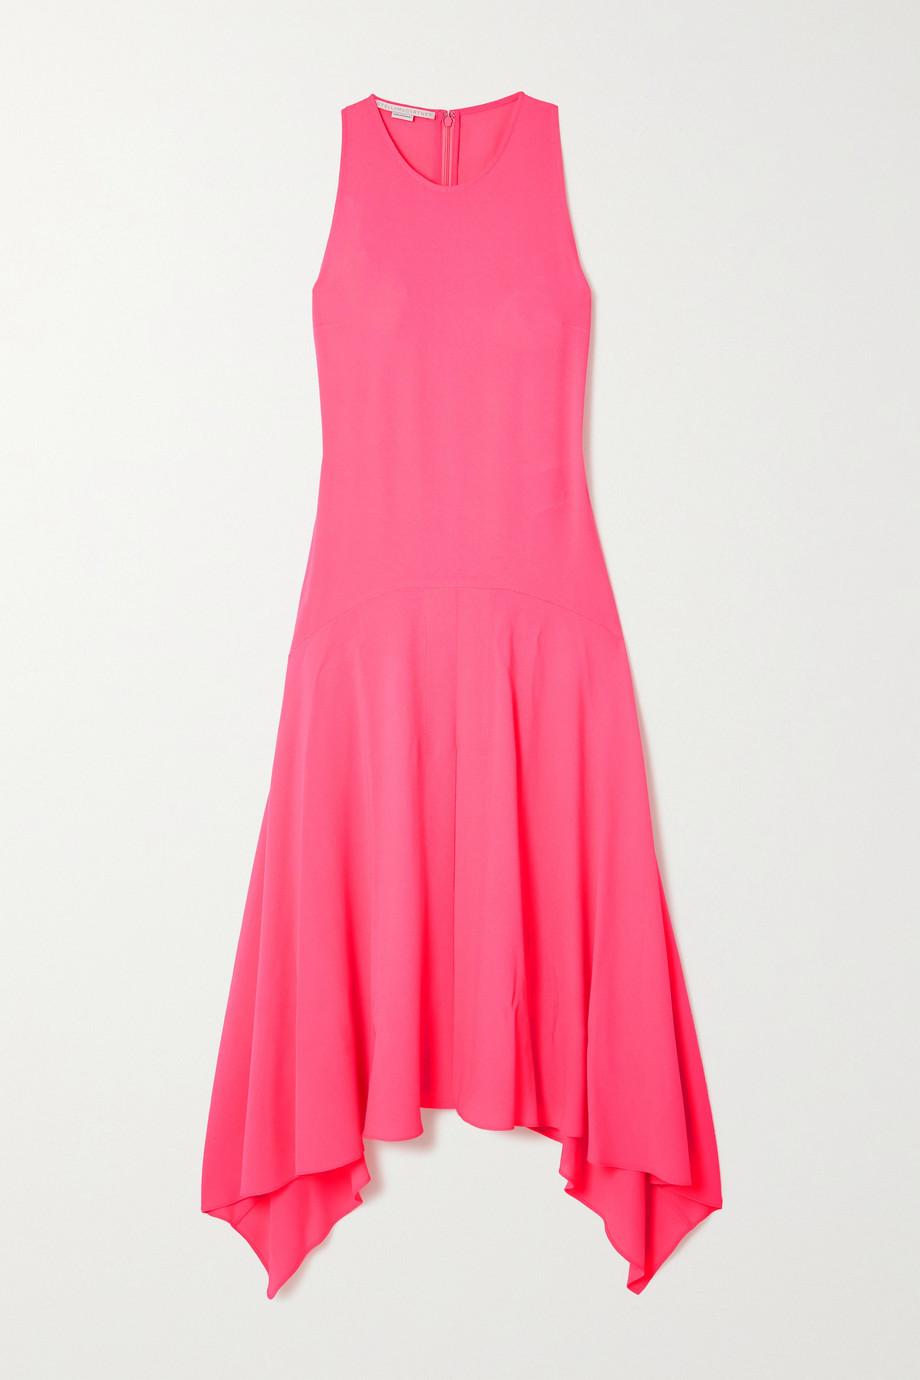 Stella McCartney Anabelle asymmetric crepe dress